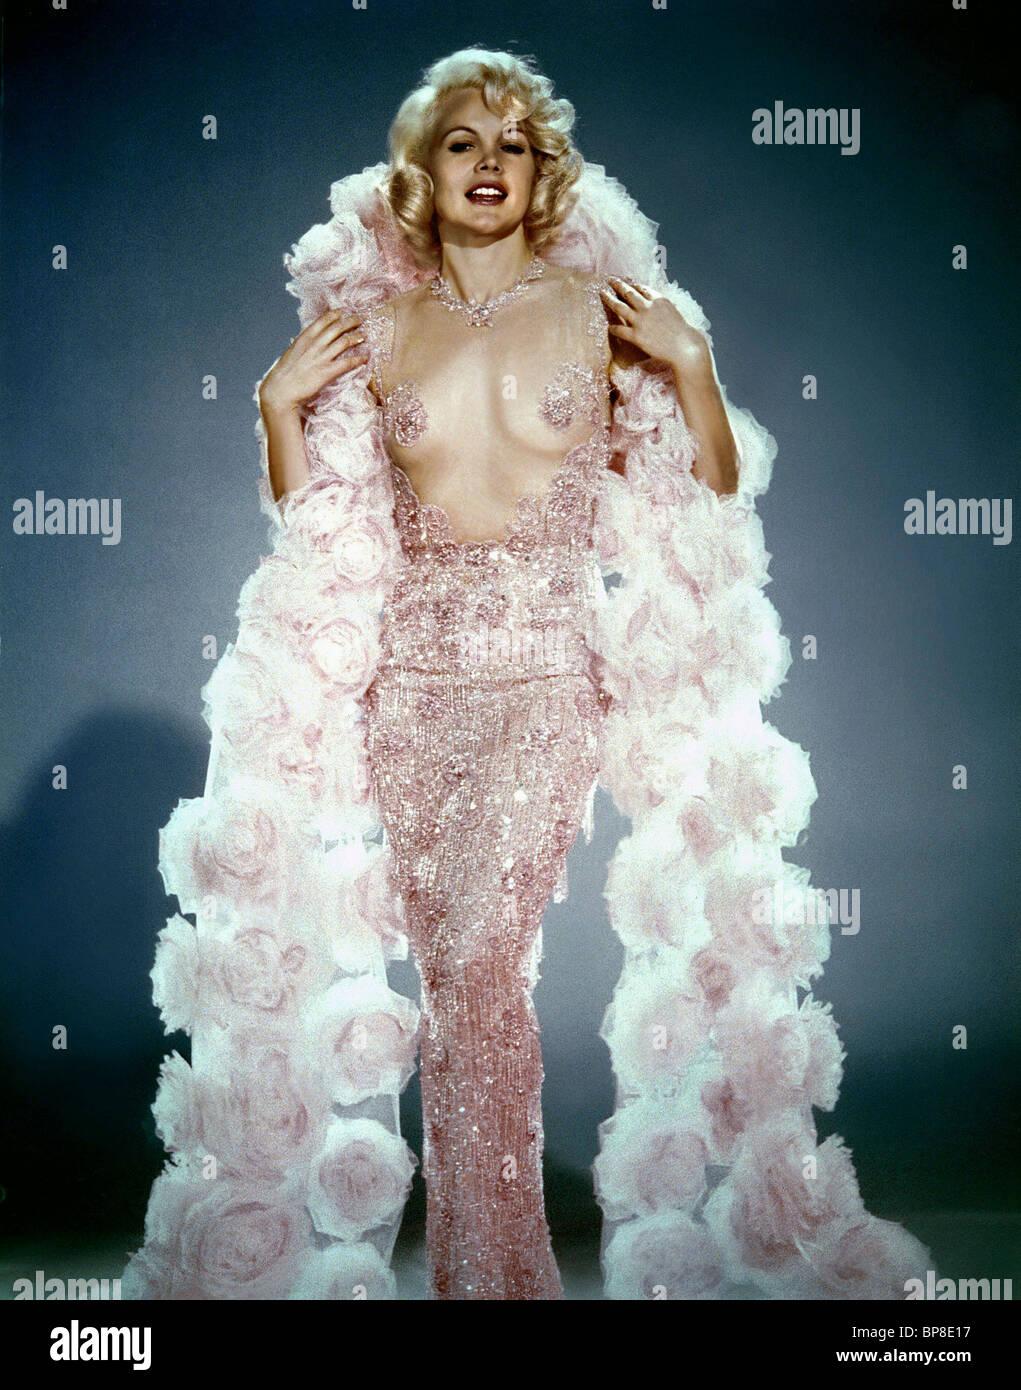 Ashley Monique Clark Hot tube Cherie Lunghi (born 1952),Prudence Hyman